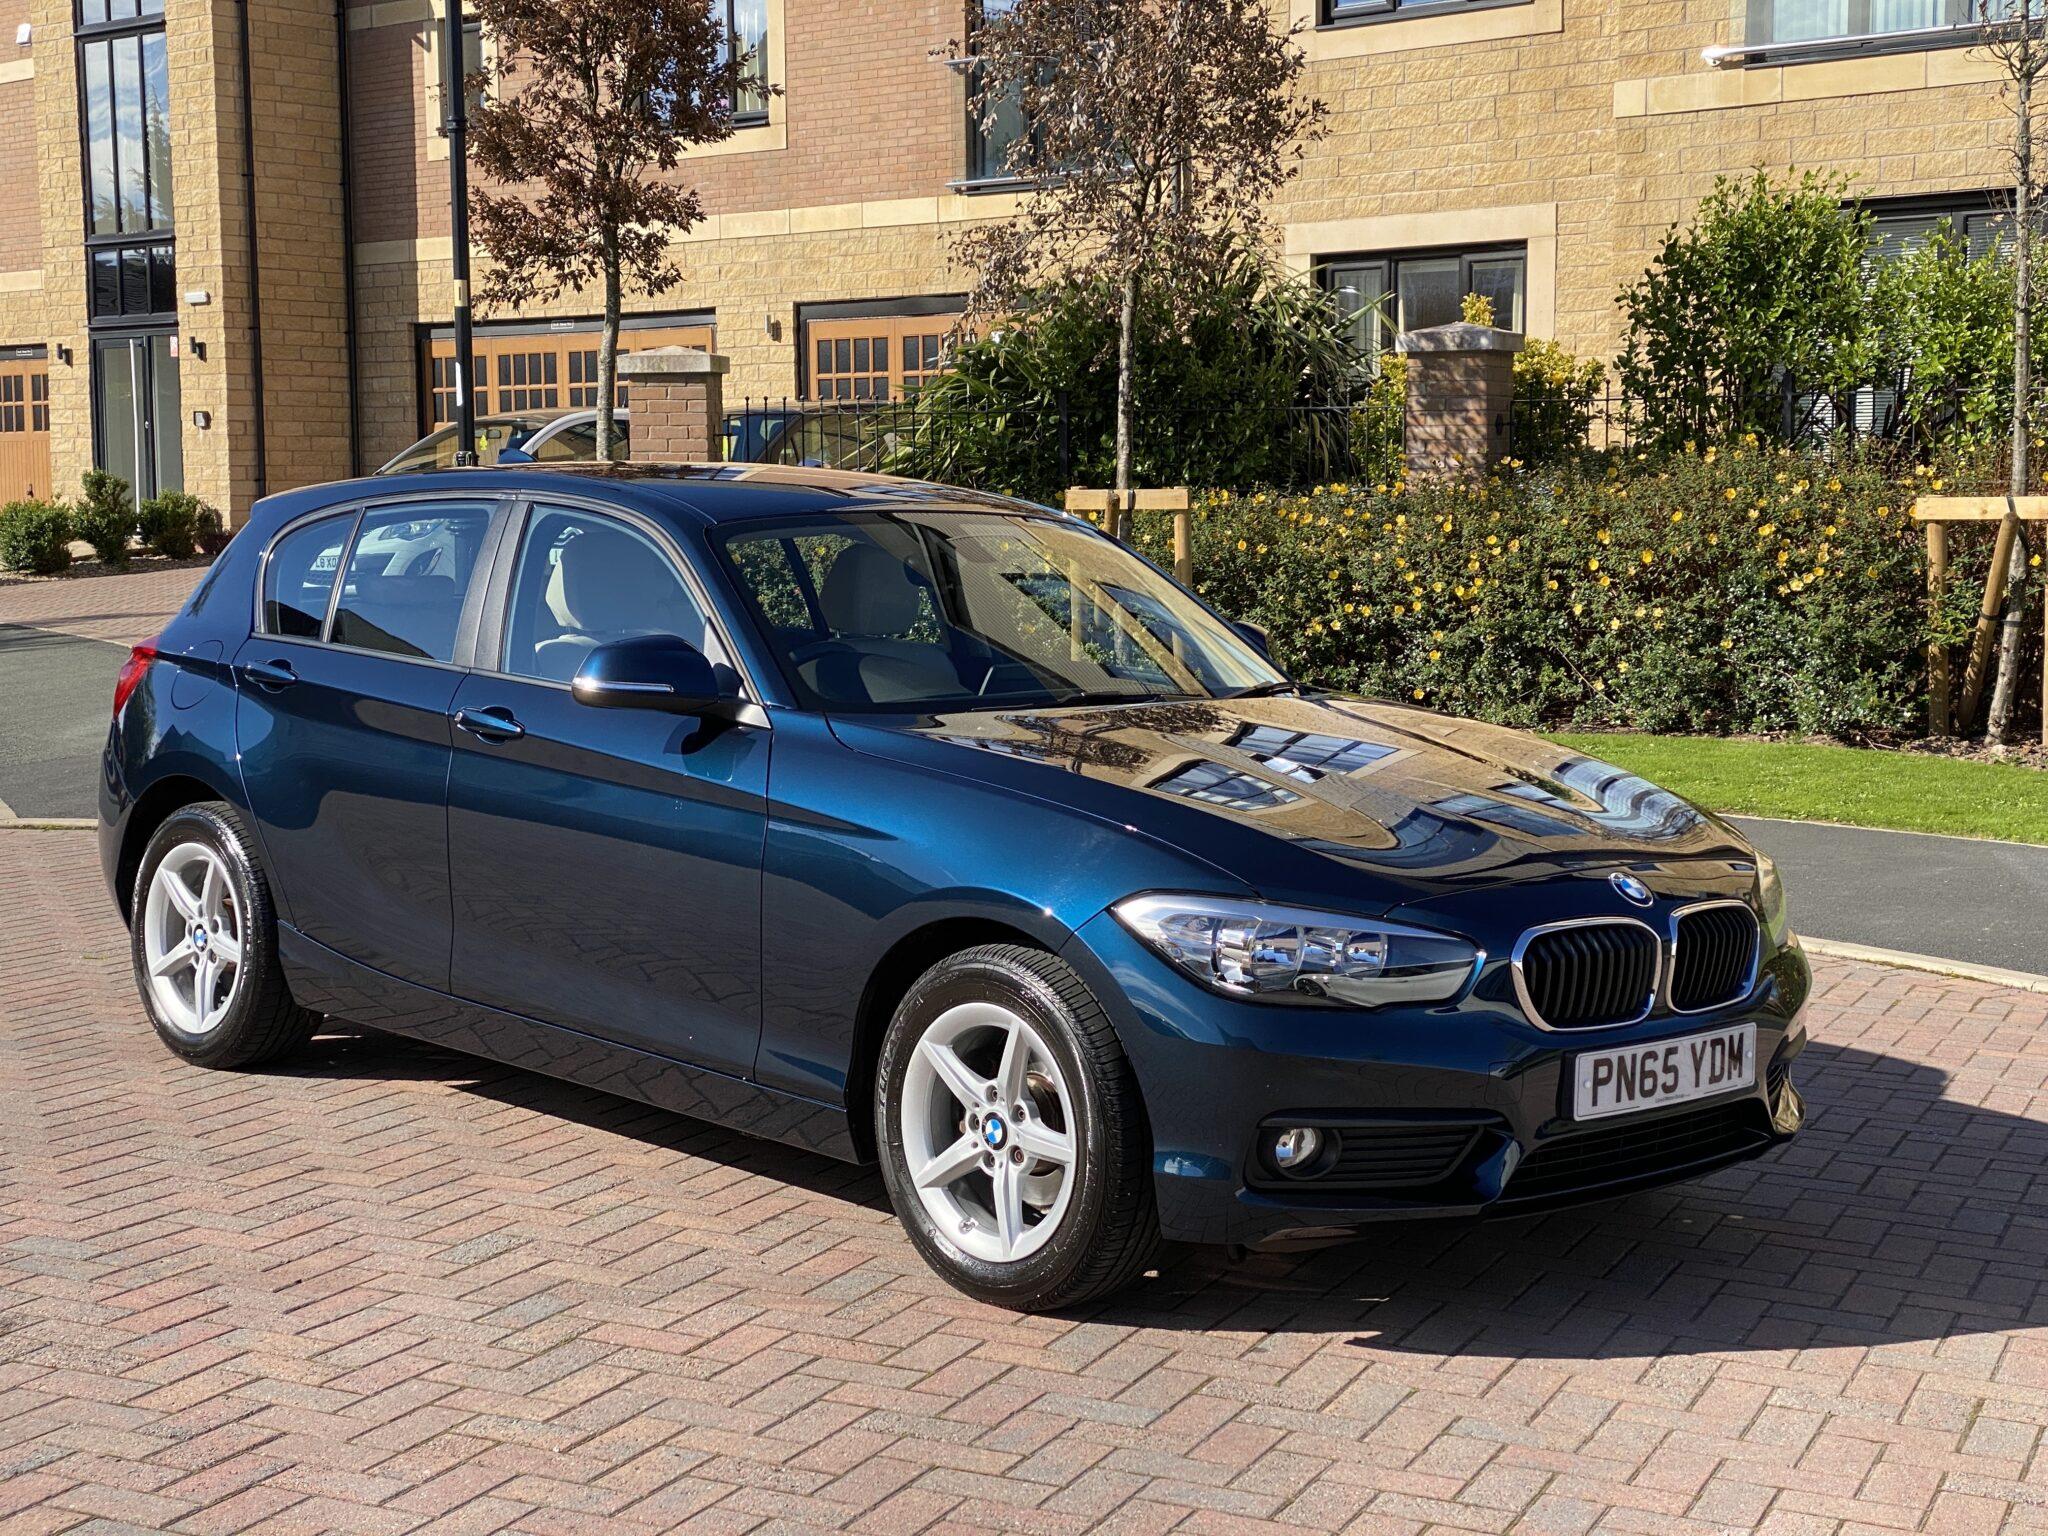 2015 65 BMW 116D SE AUTOMATIC 5 DOOR 1 Owner FBSH Only 41K Mls Full Leather & Navigation